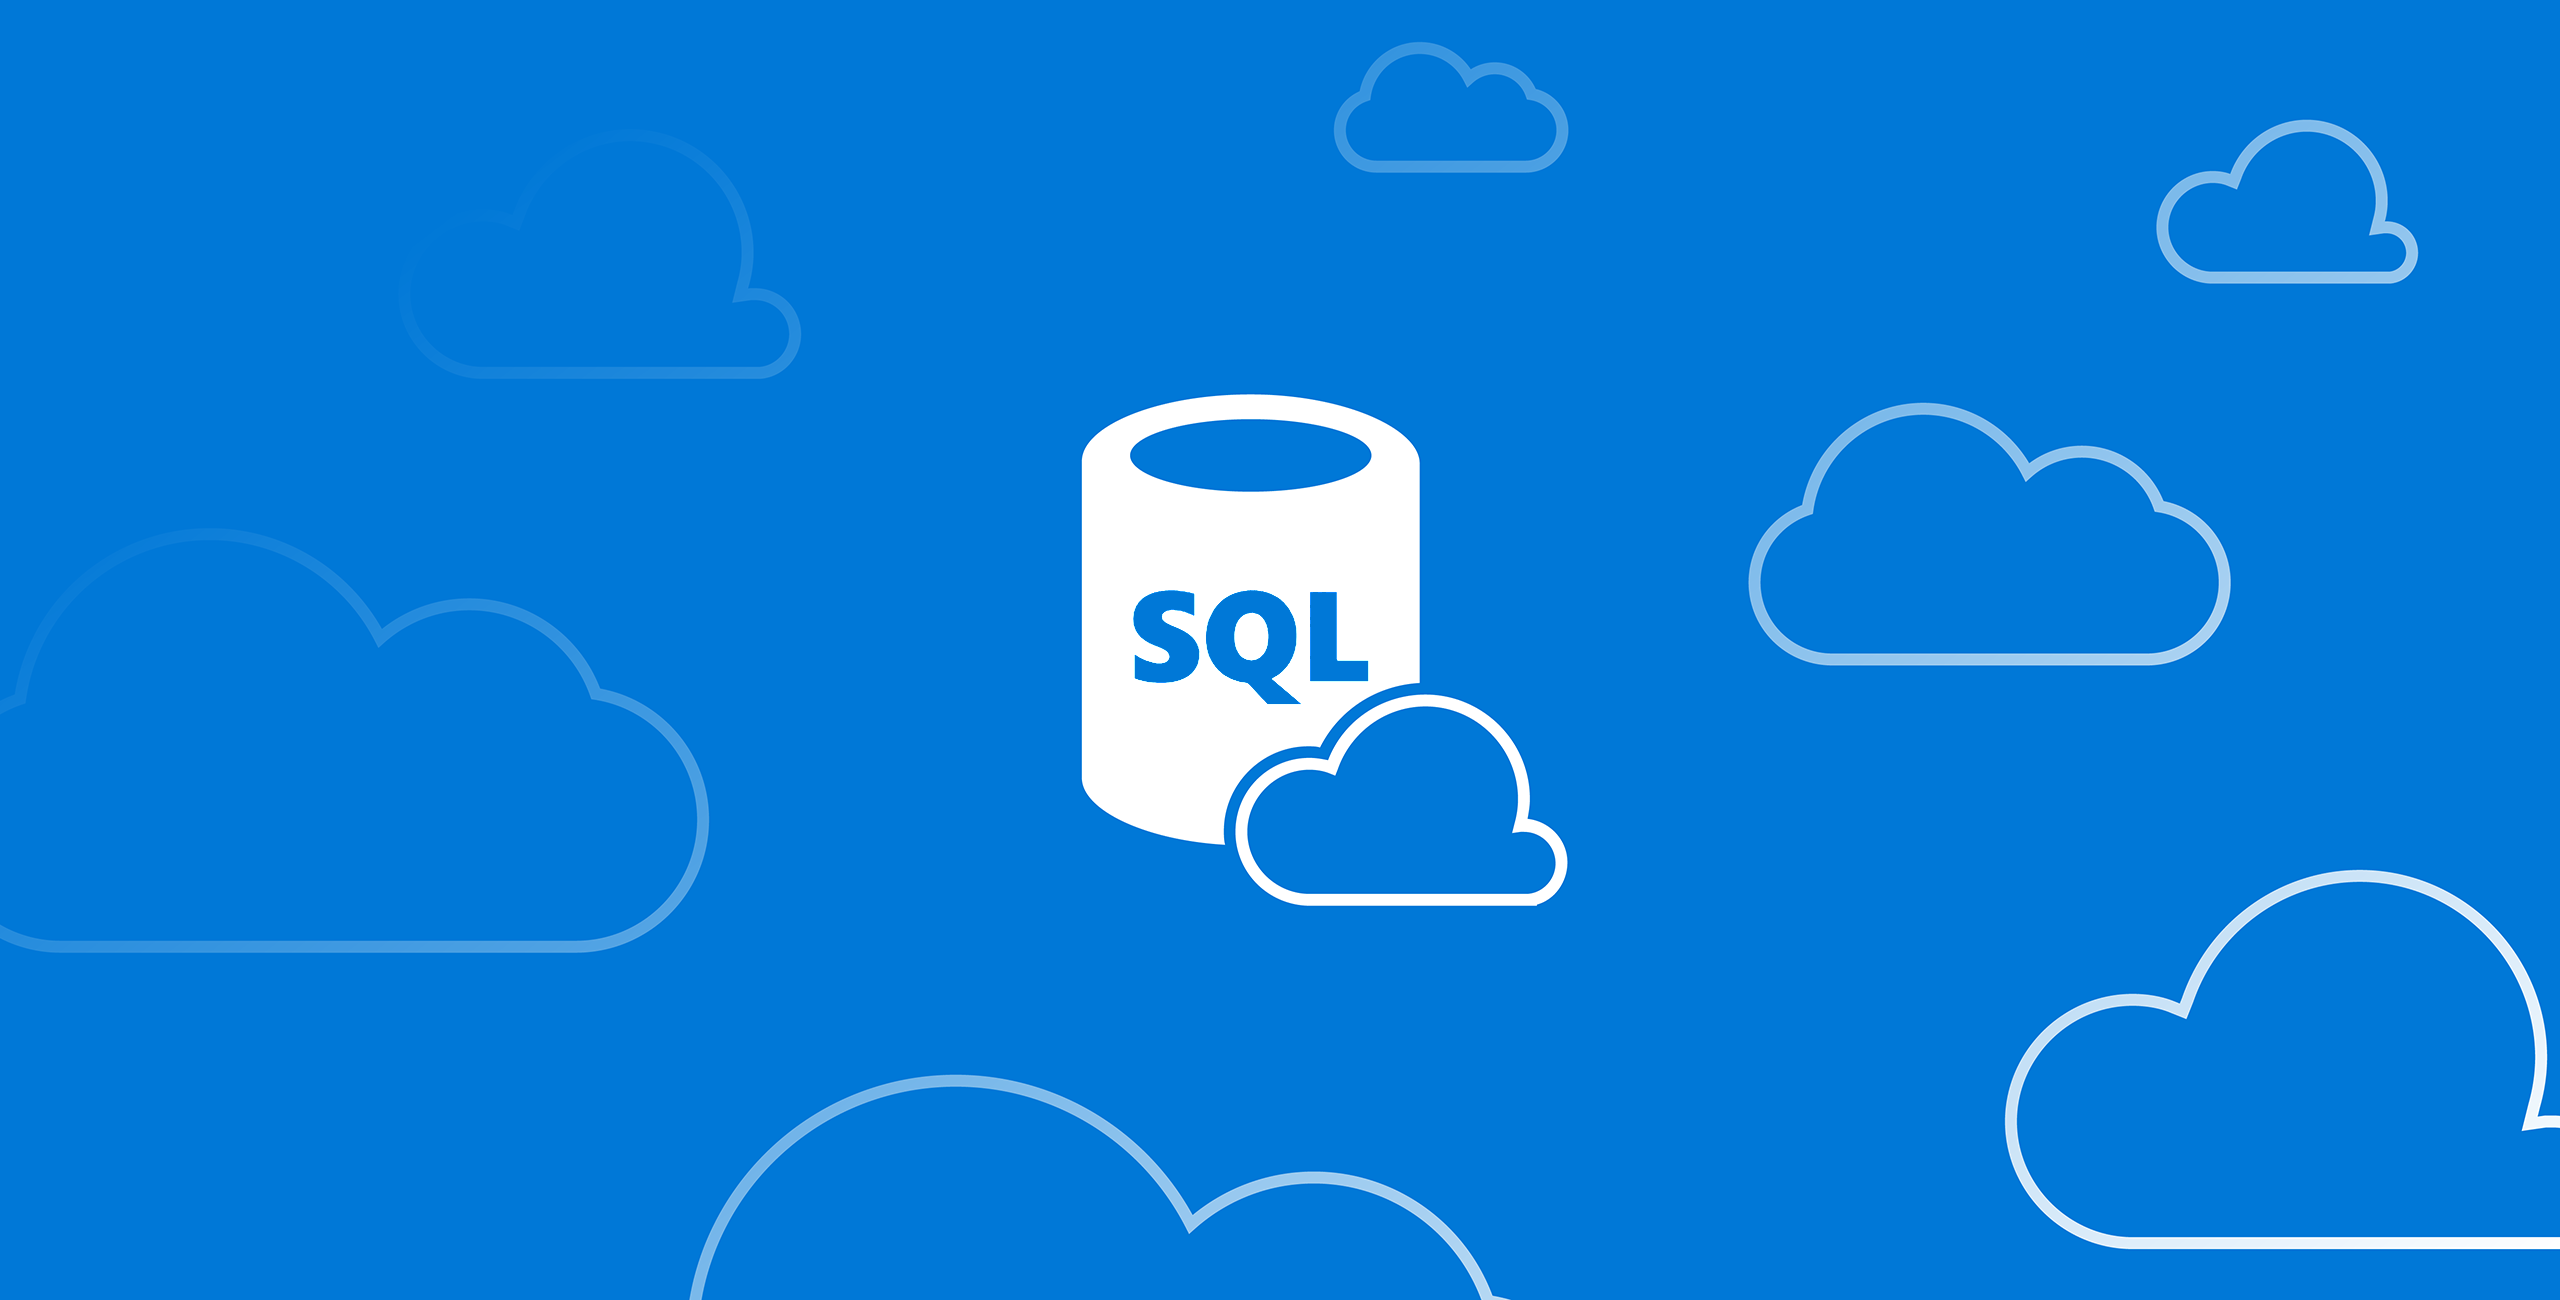 دیتابیس SQL